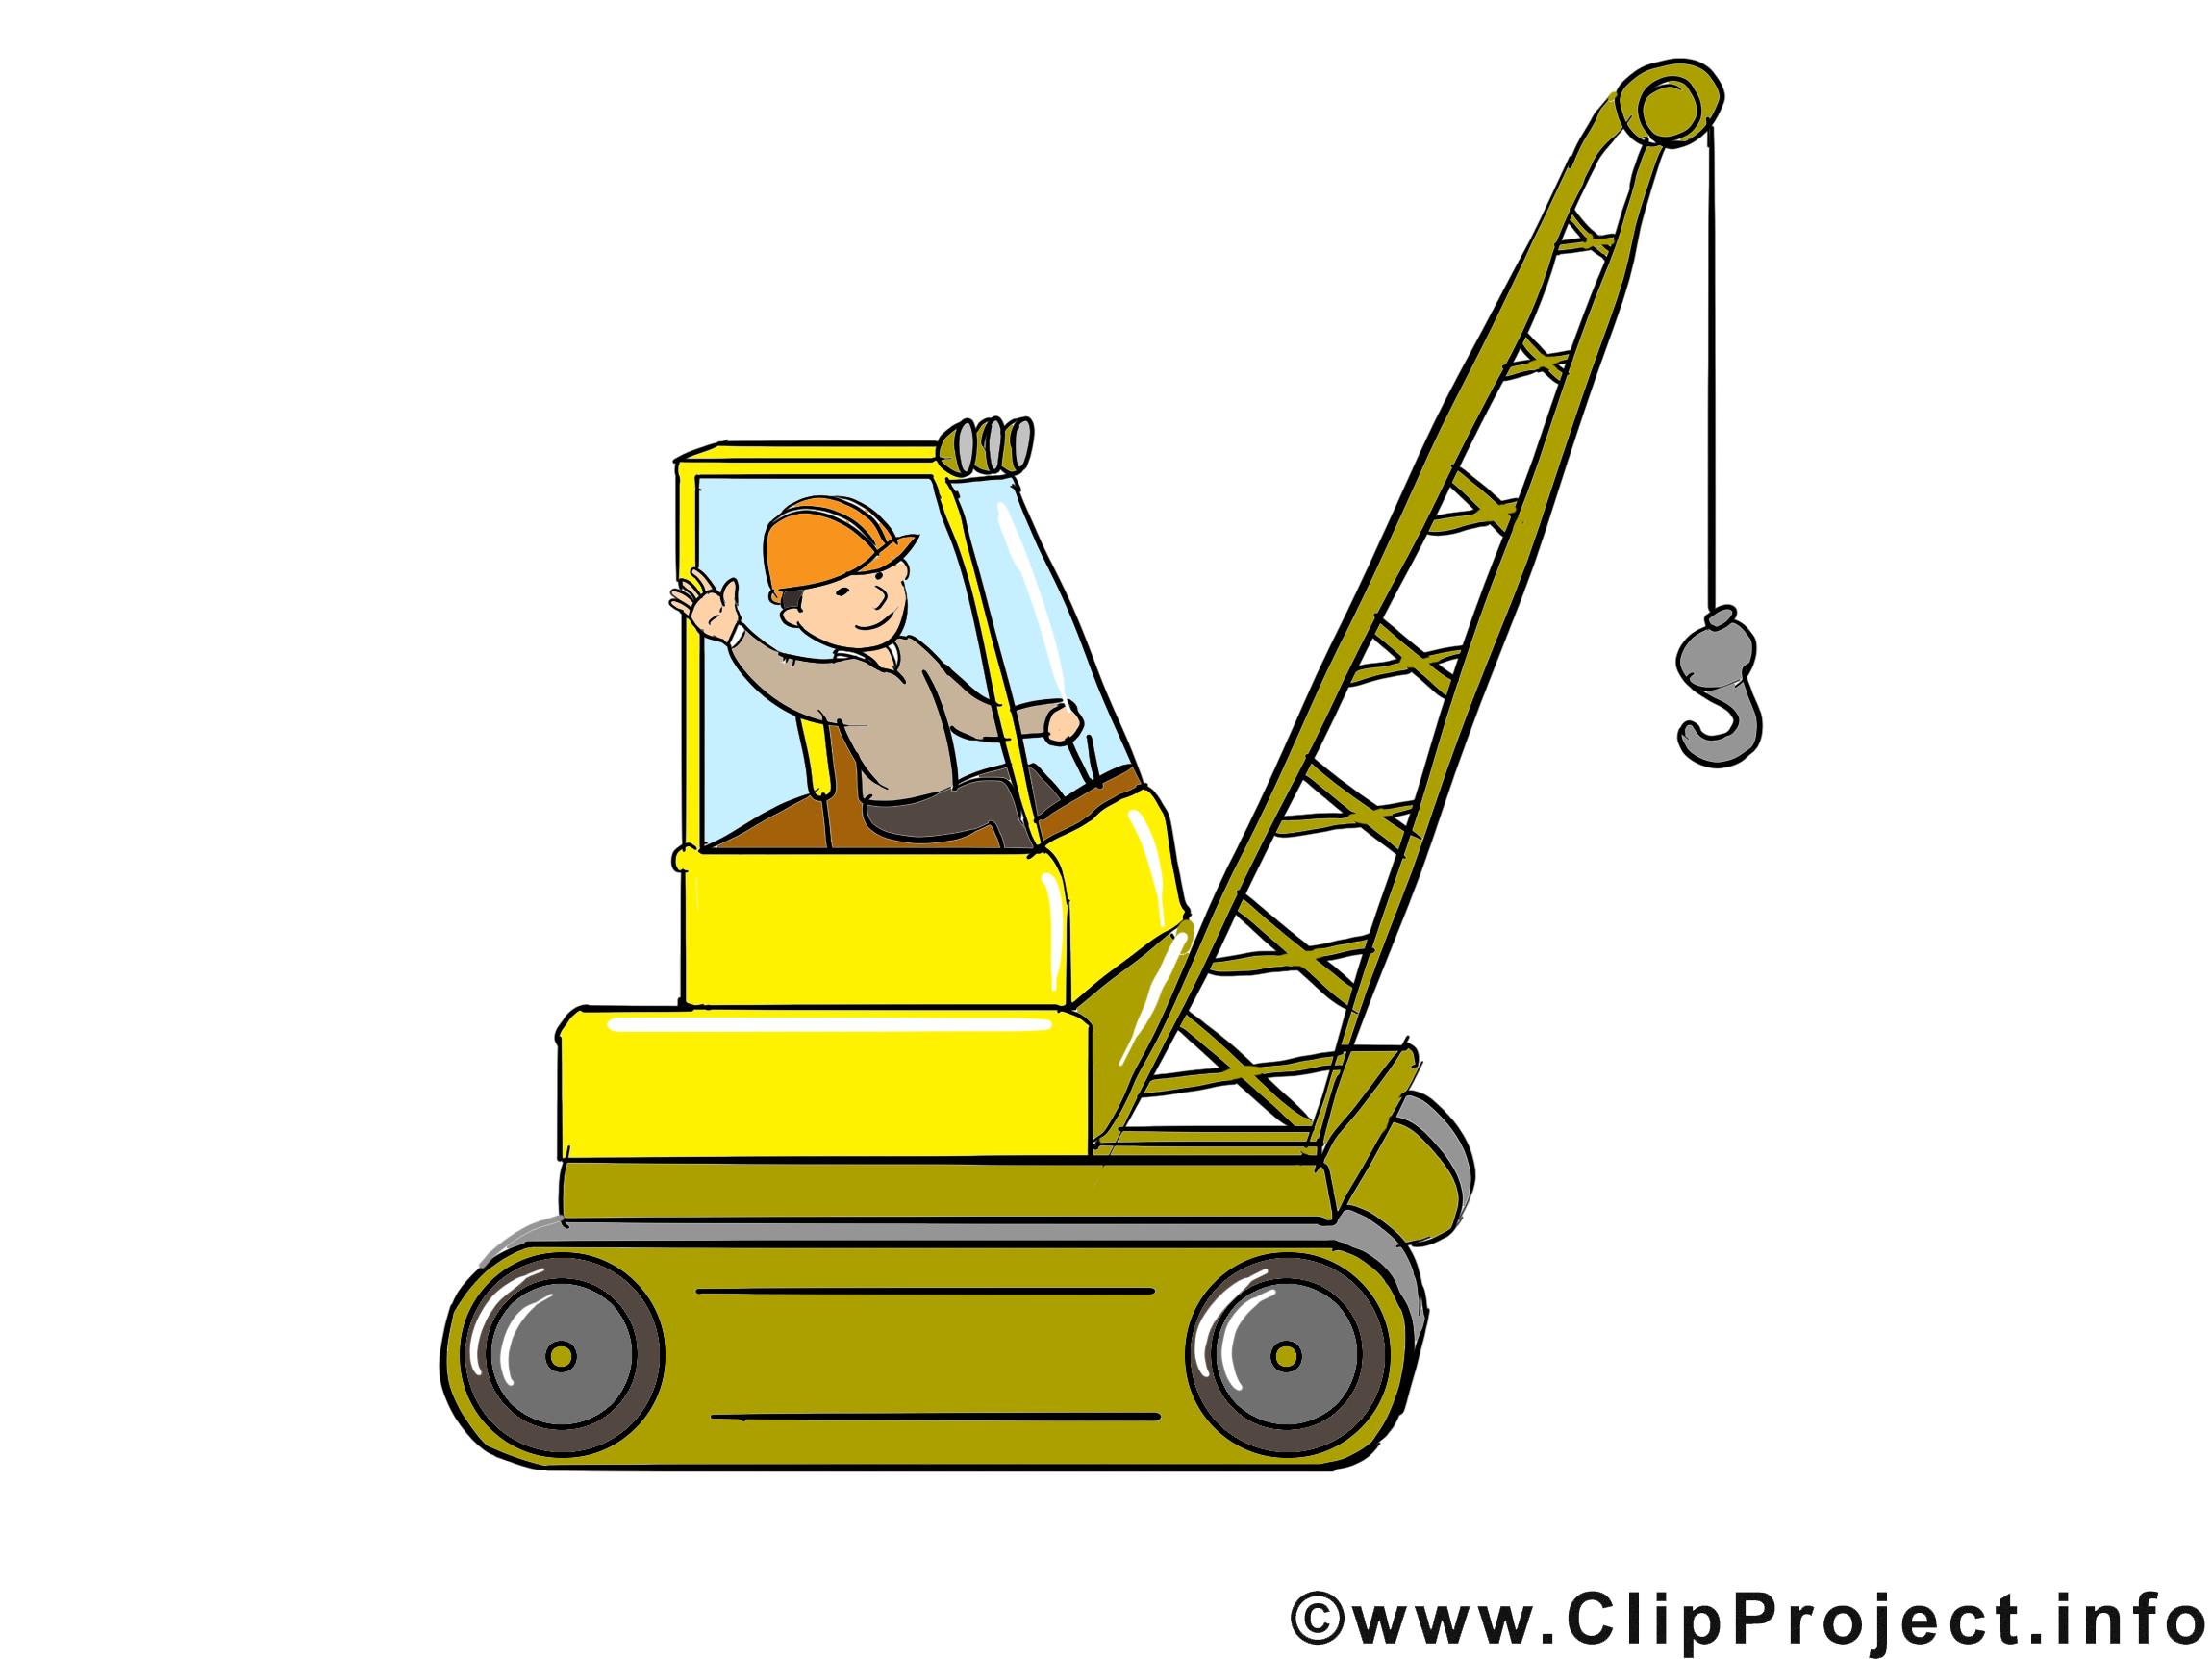 Grutier image gratuite - Profession cliparts